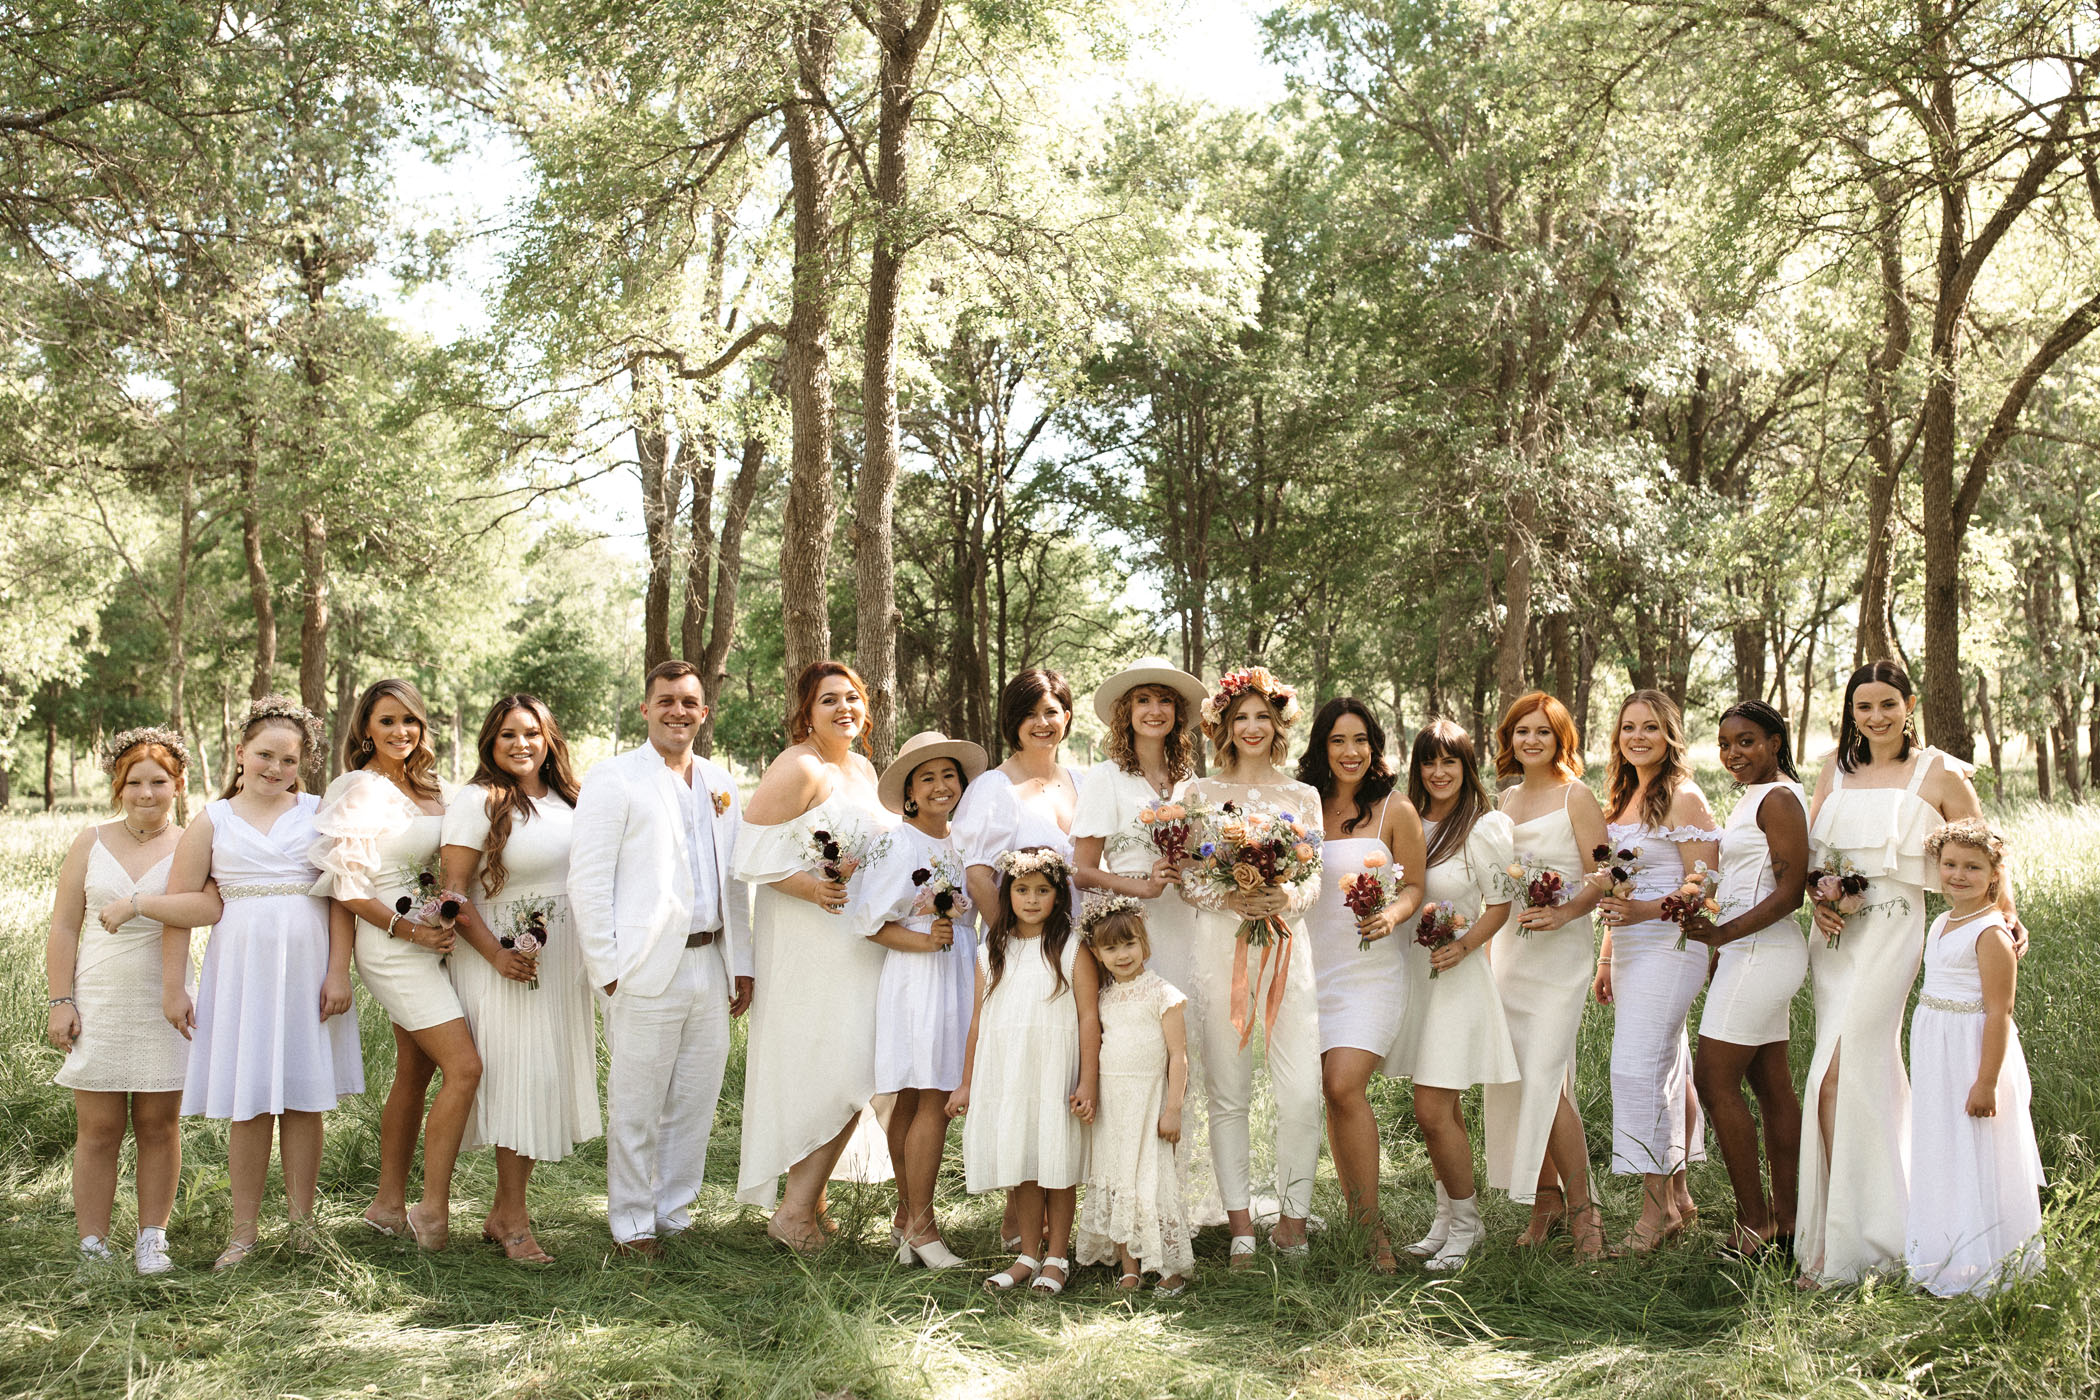 White Wedding Party Attire